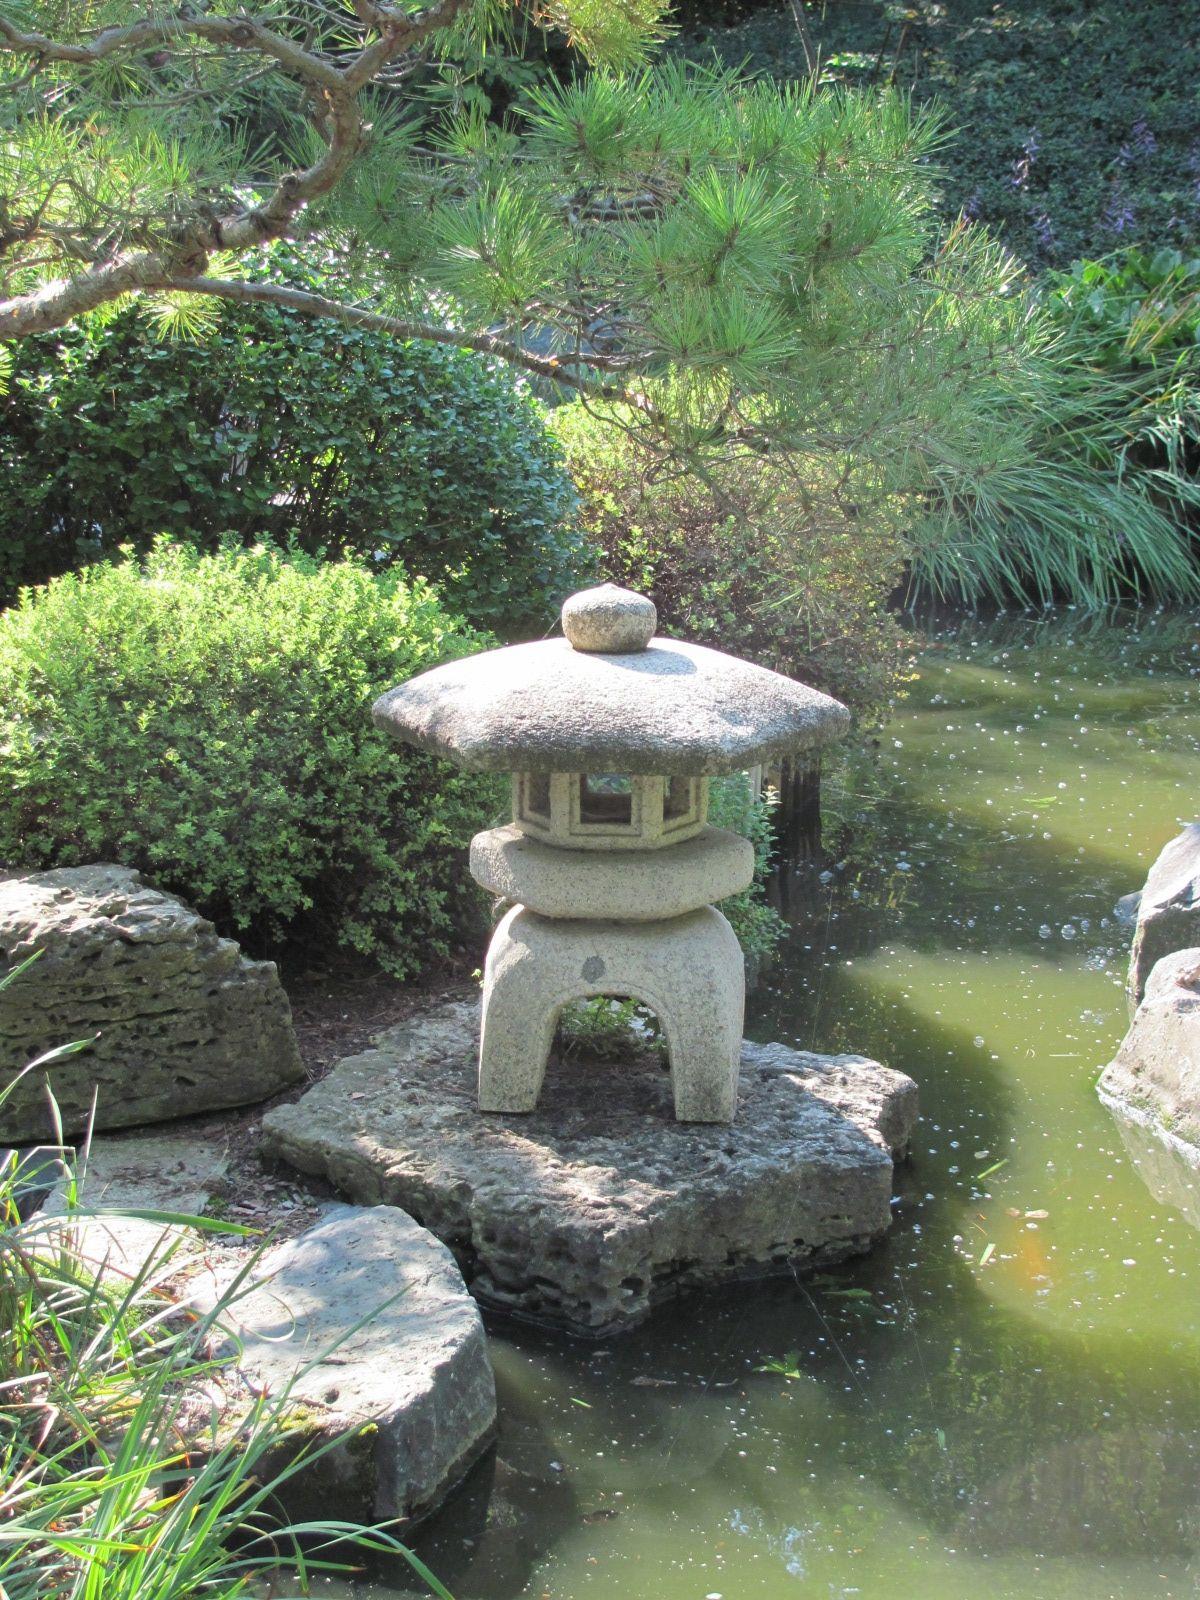 Zen Garden Designs Small - Cadagu.com | Zen garden design ...